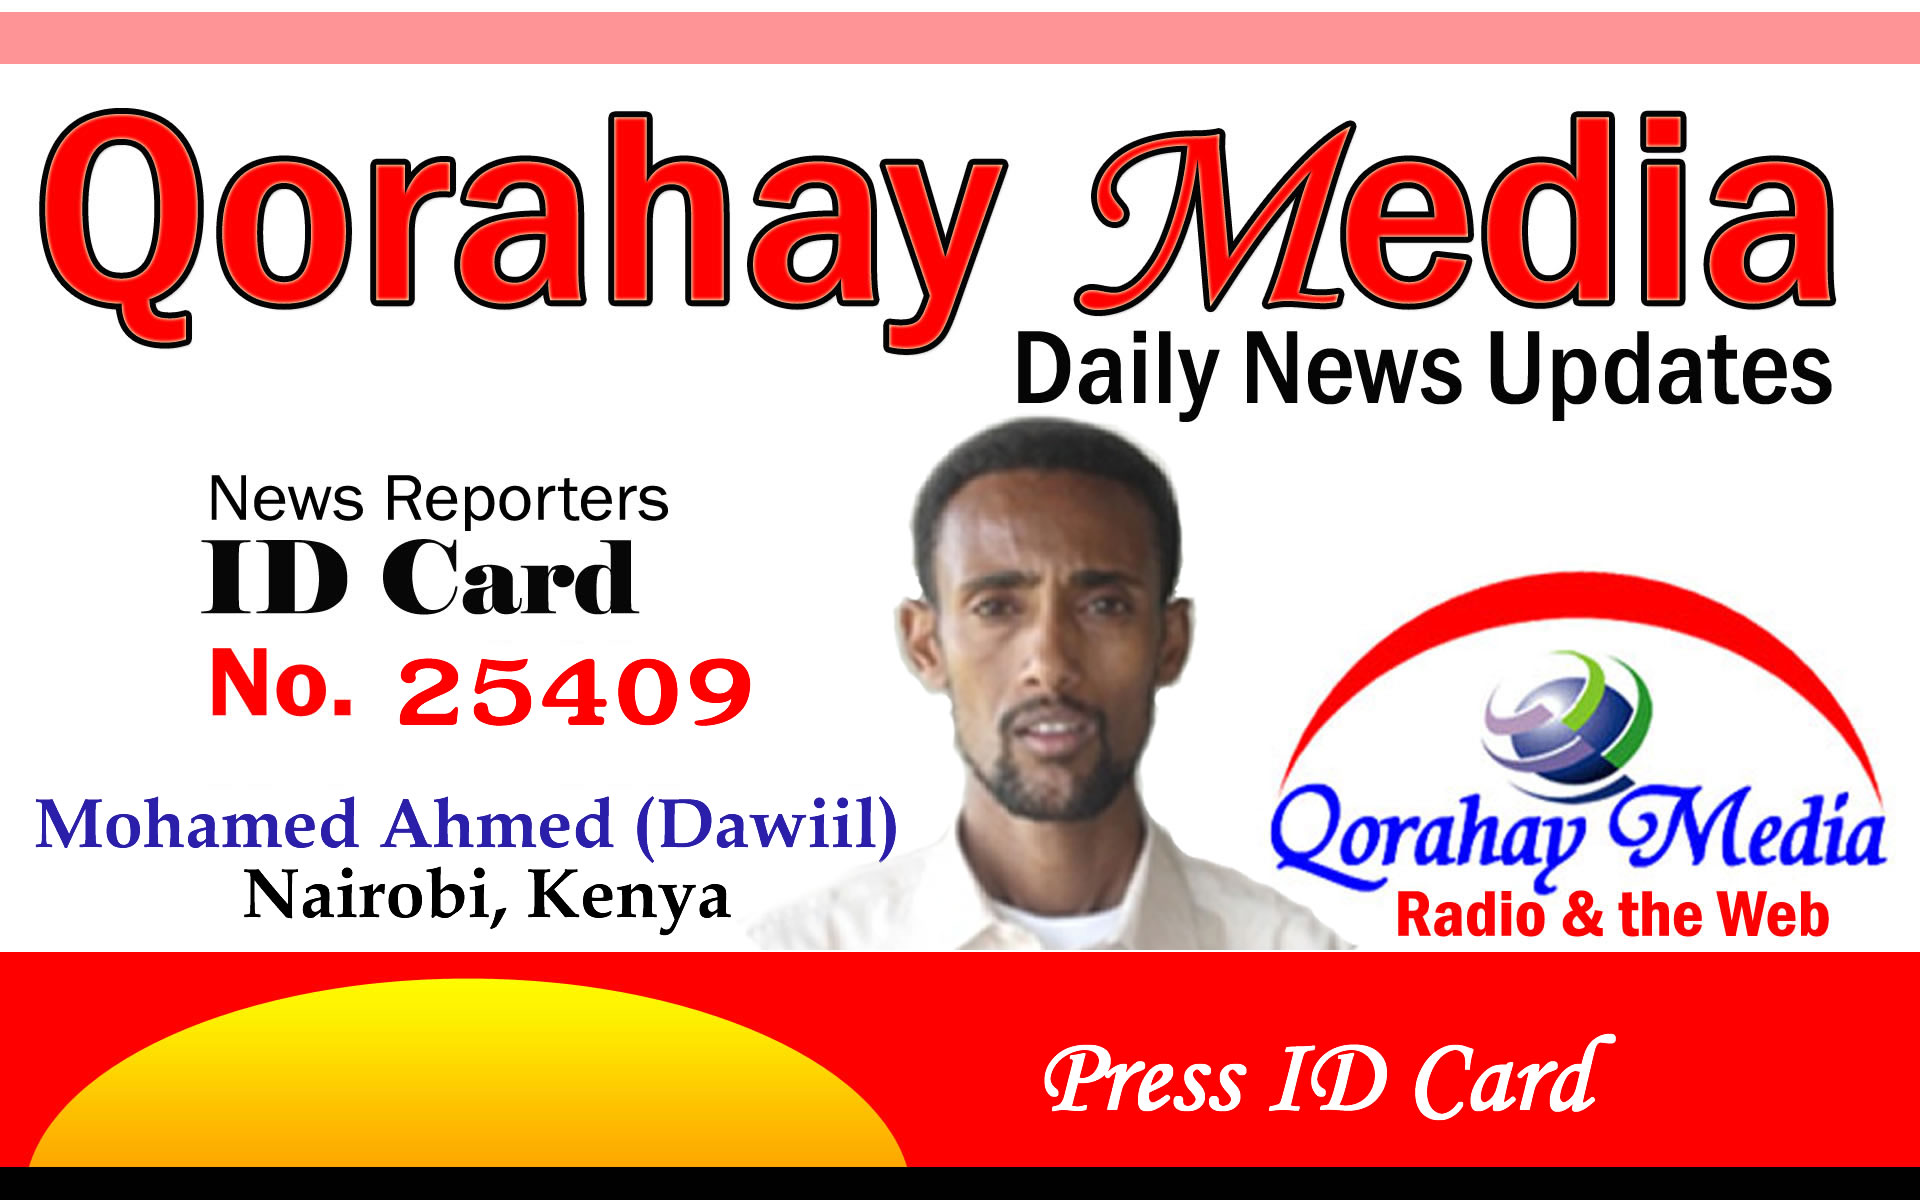 Plights of Journalist in Ethiopia